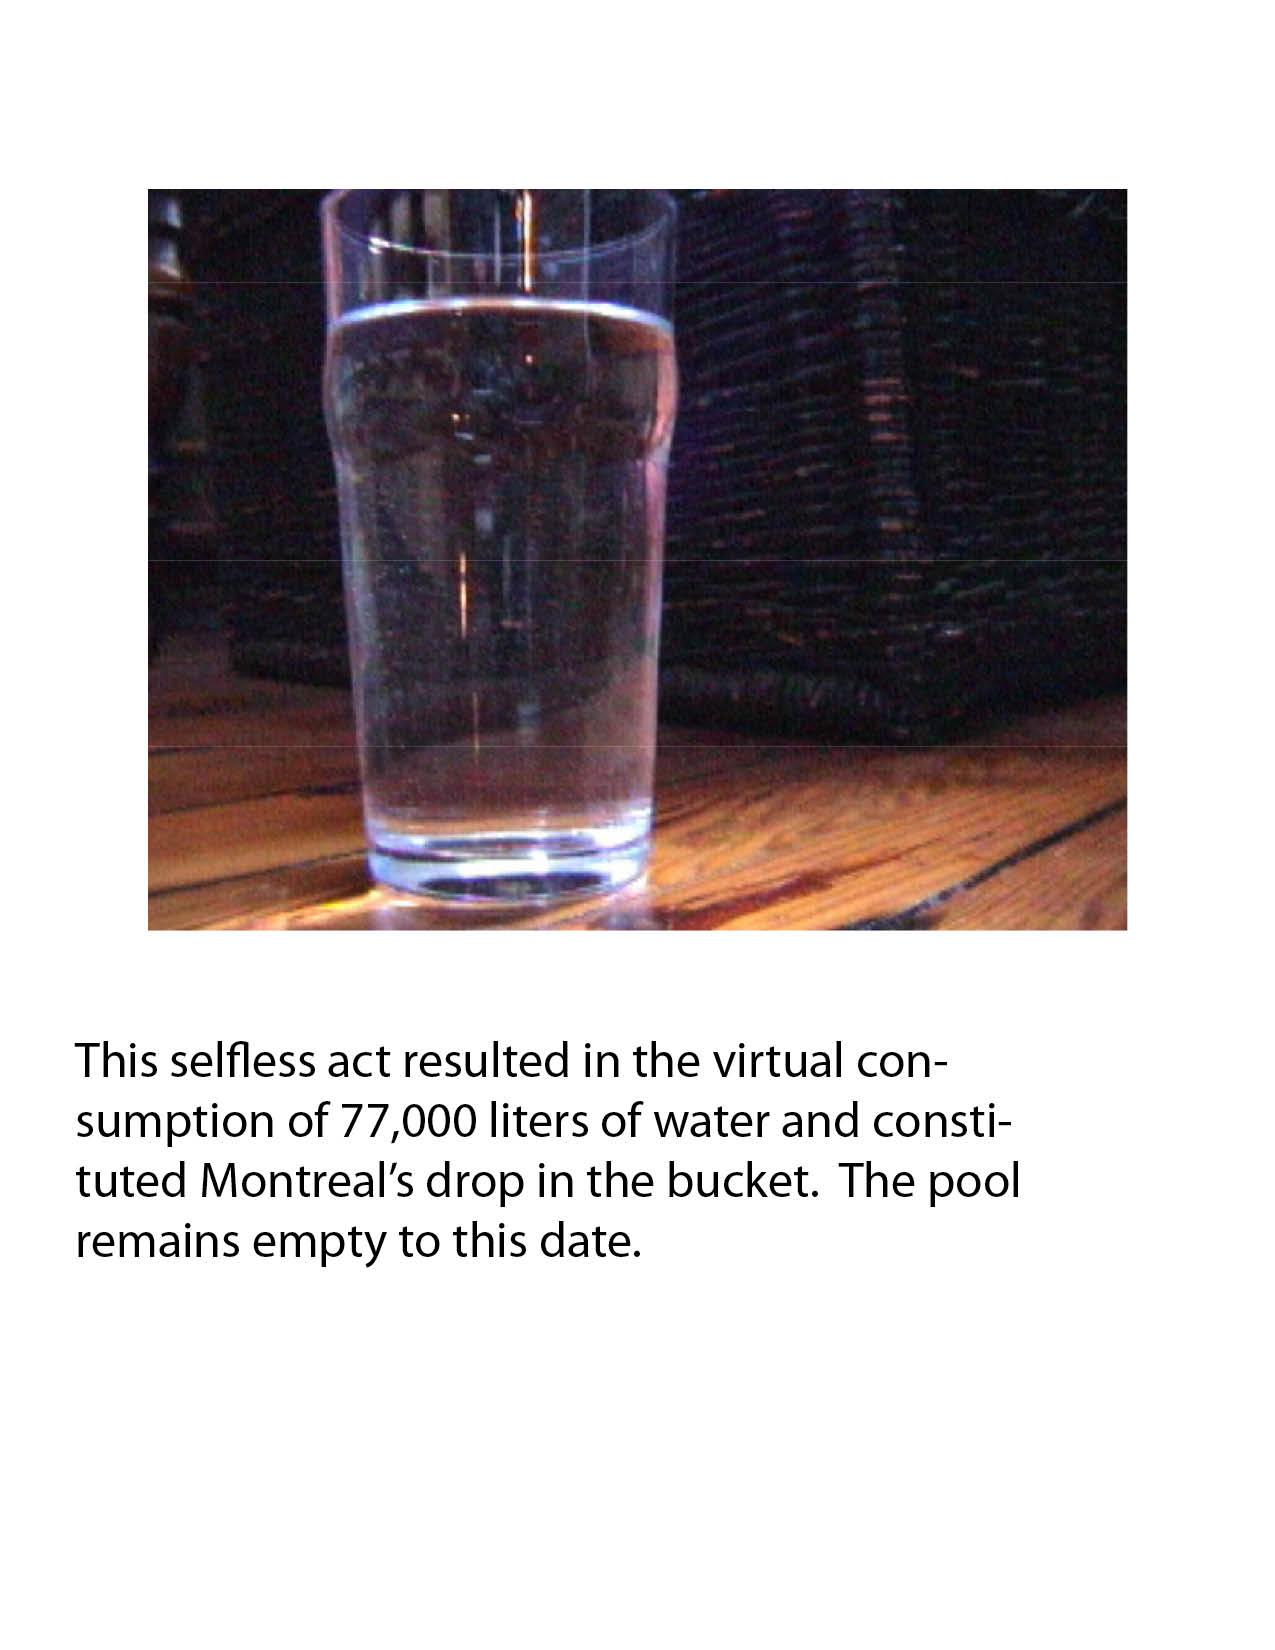 Aquathon Montreal4.jpg